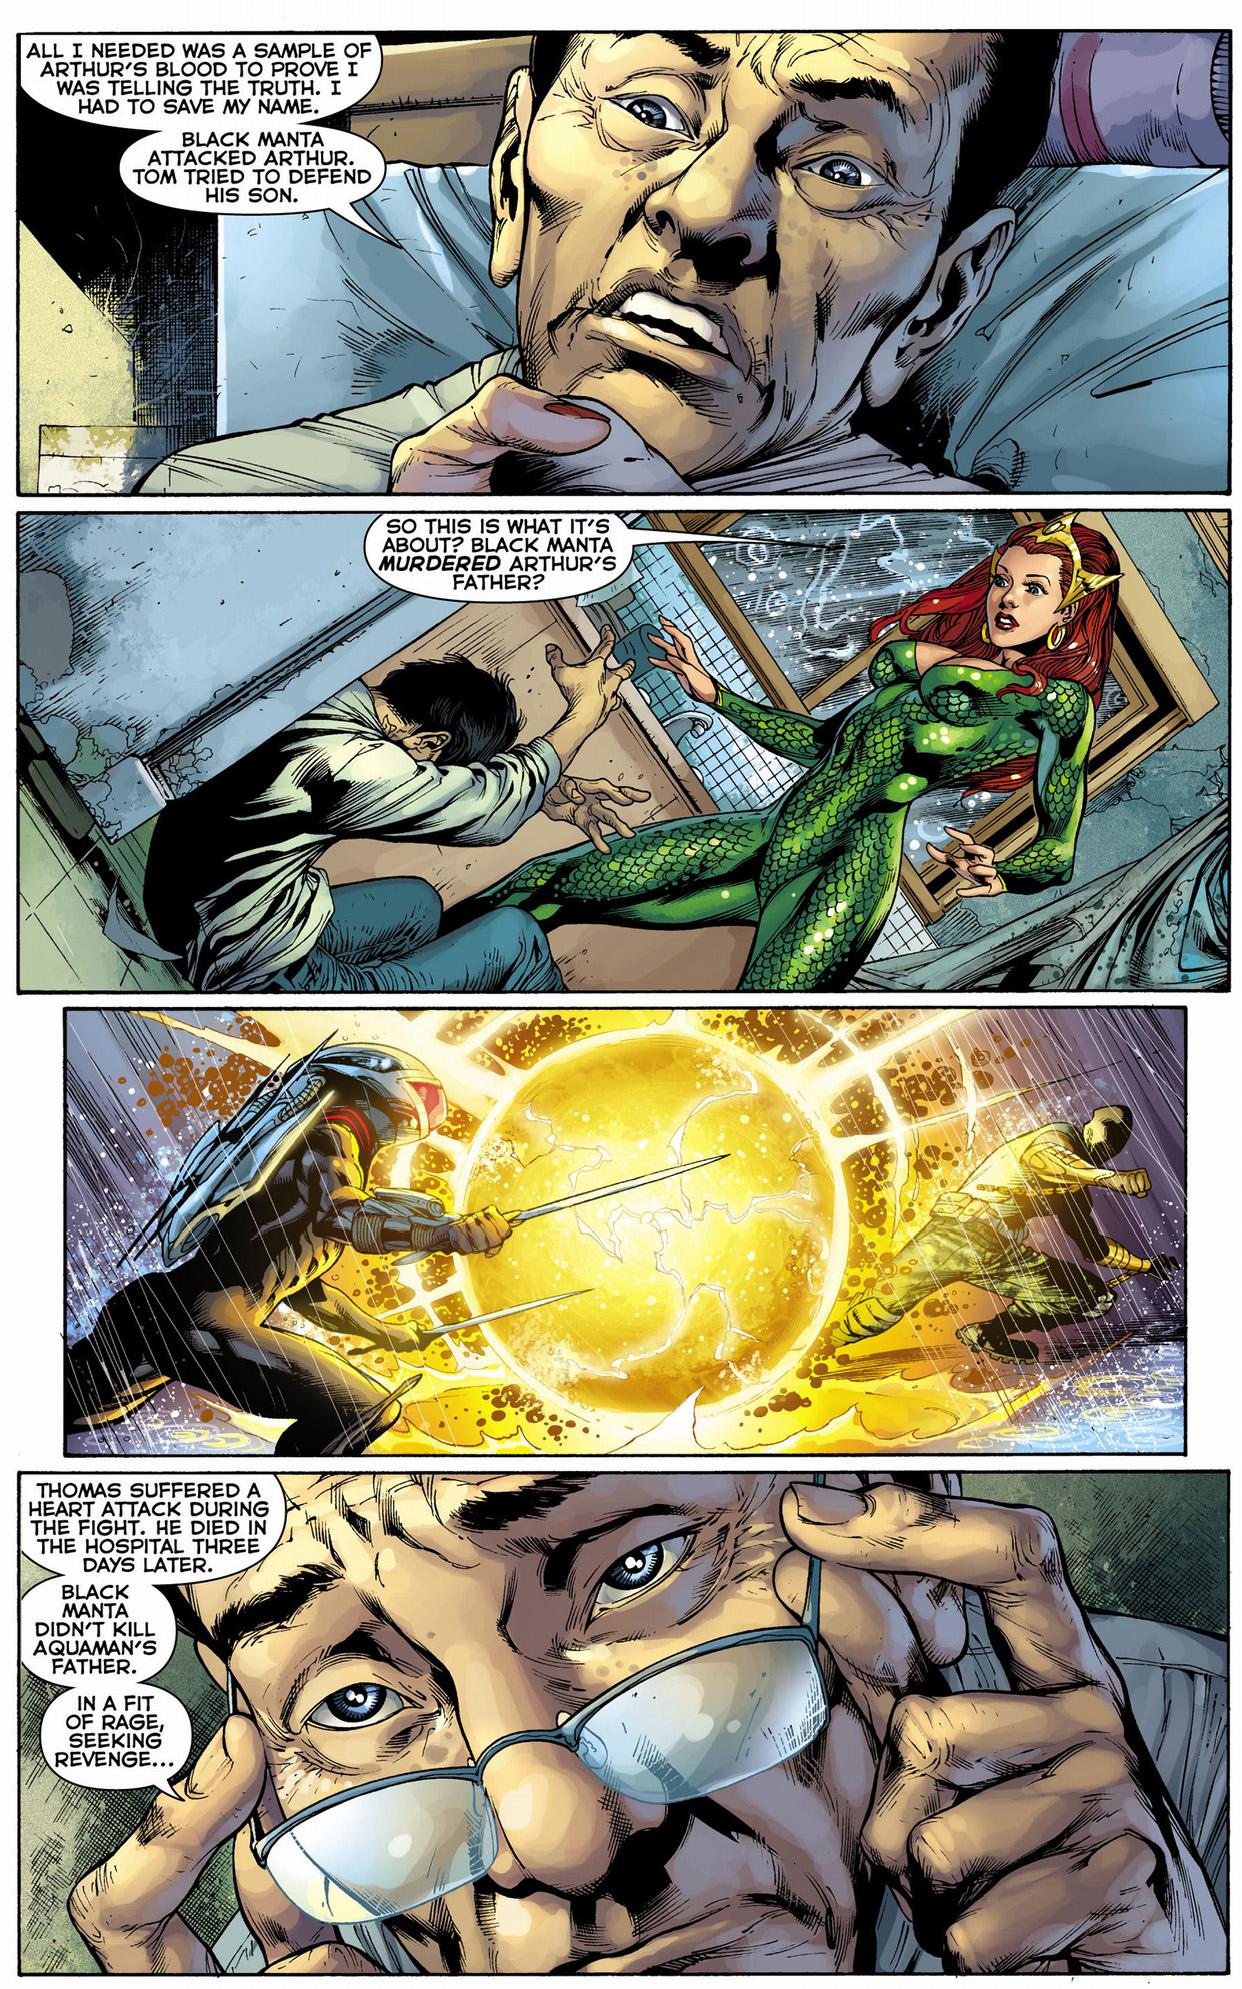 Doctor Shin's History With Aquaman   Comicnewbies